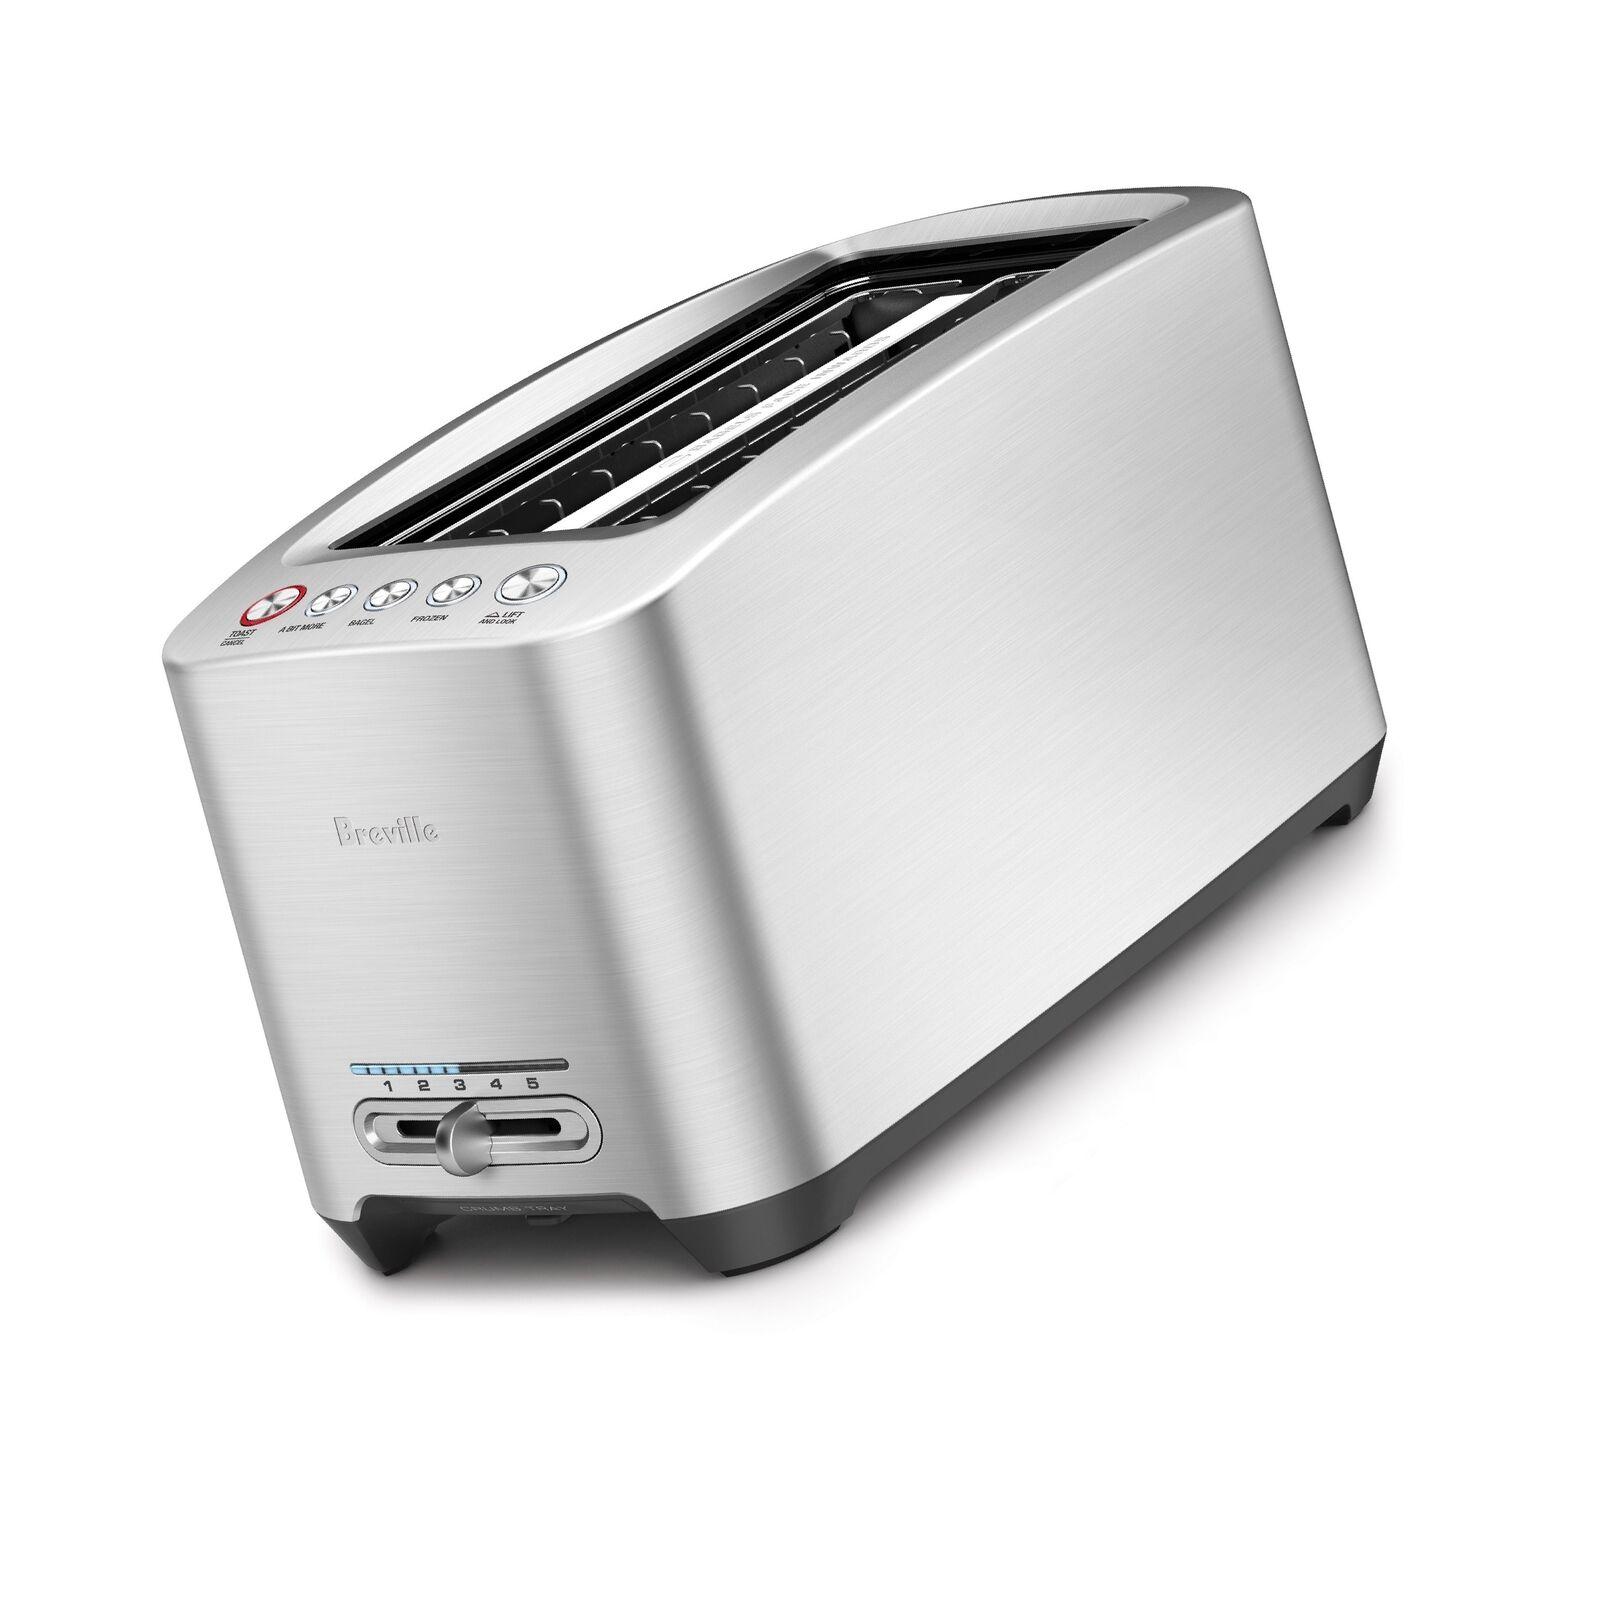 Breville BTA830XL Die-Cast 4-Slice Long Slot Smart Toaster New